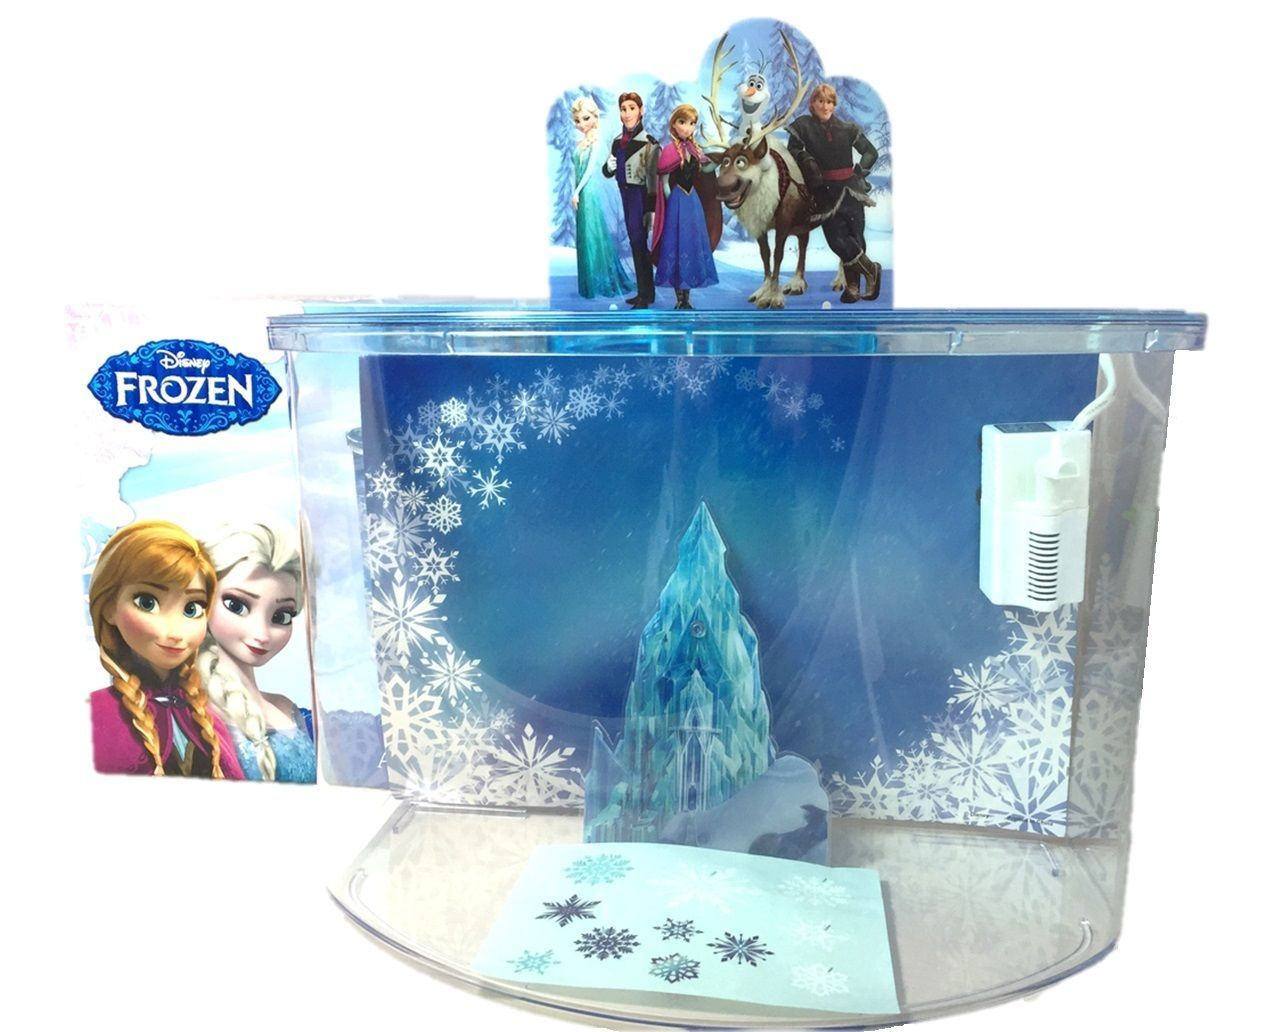 Disney frozen elsa anna olaf castle ornament penn plax for Aquarium decoration kits